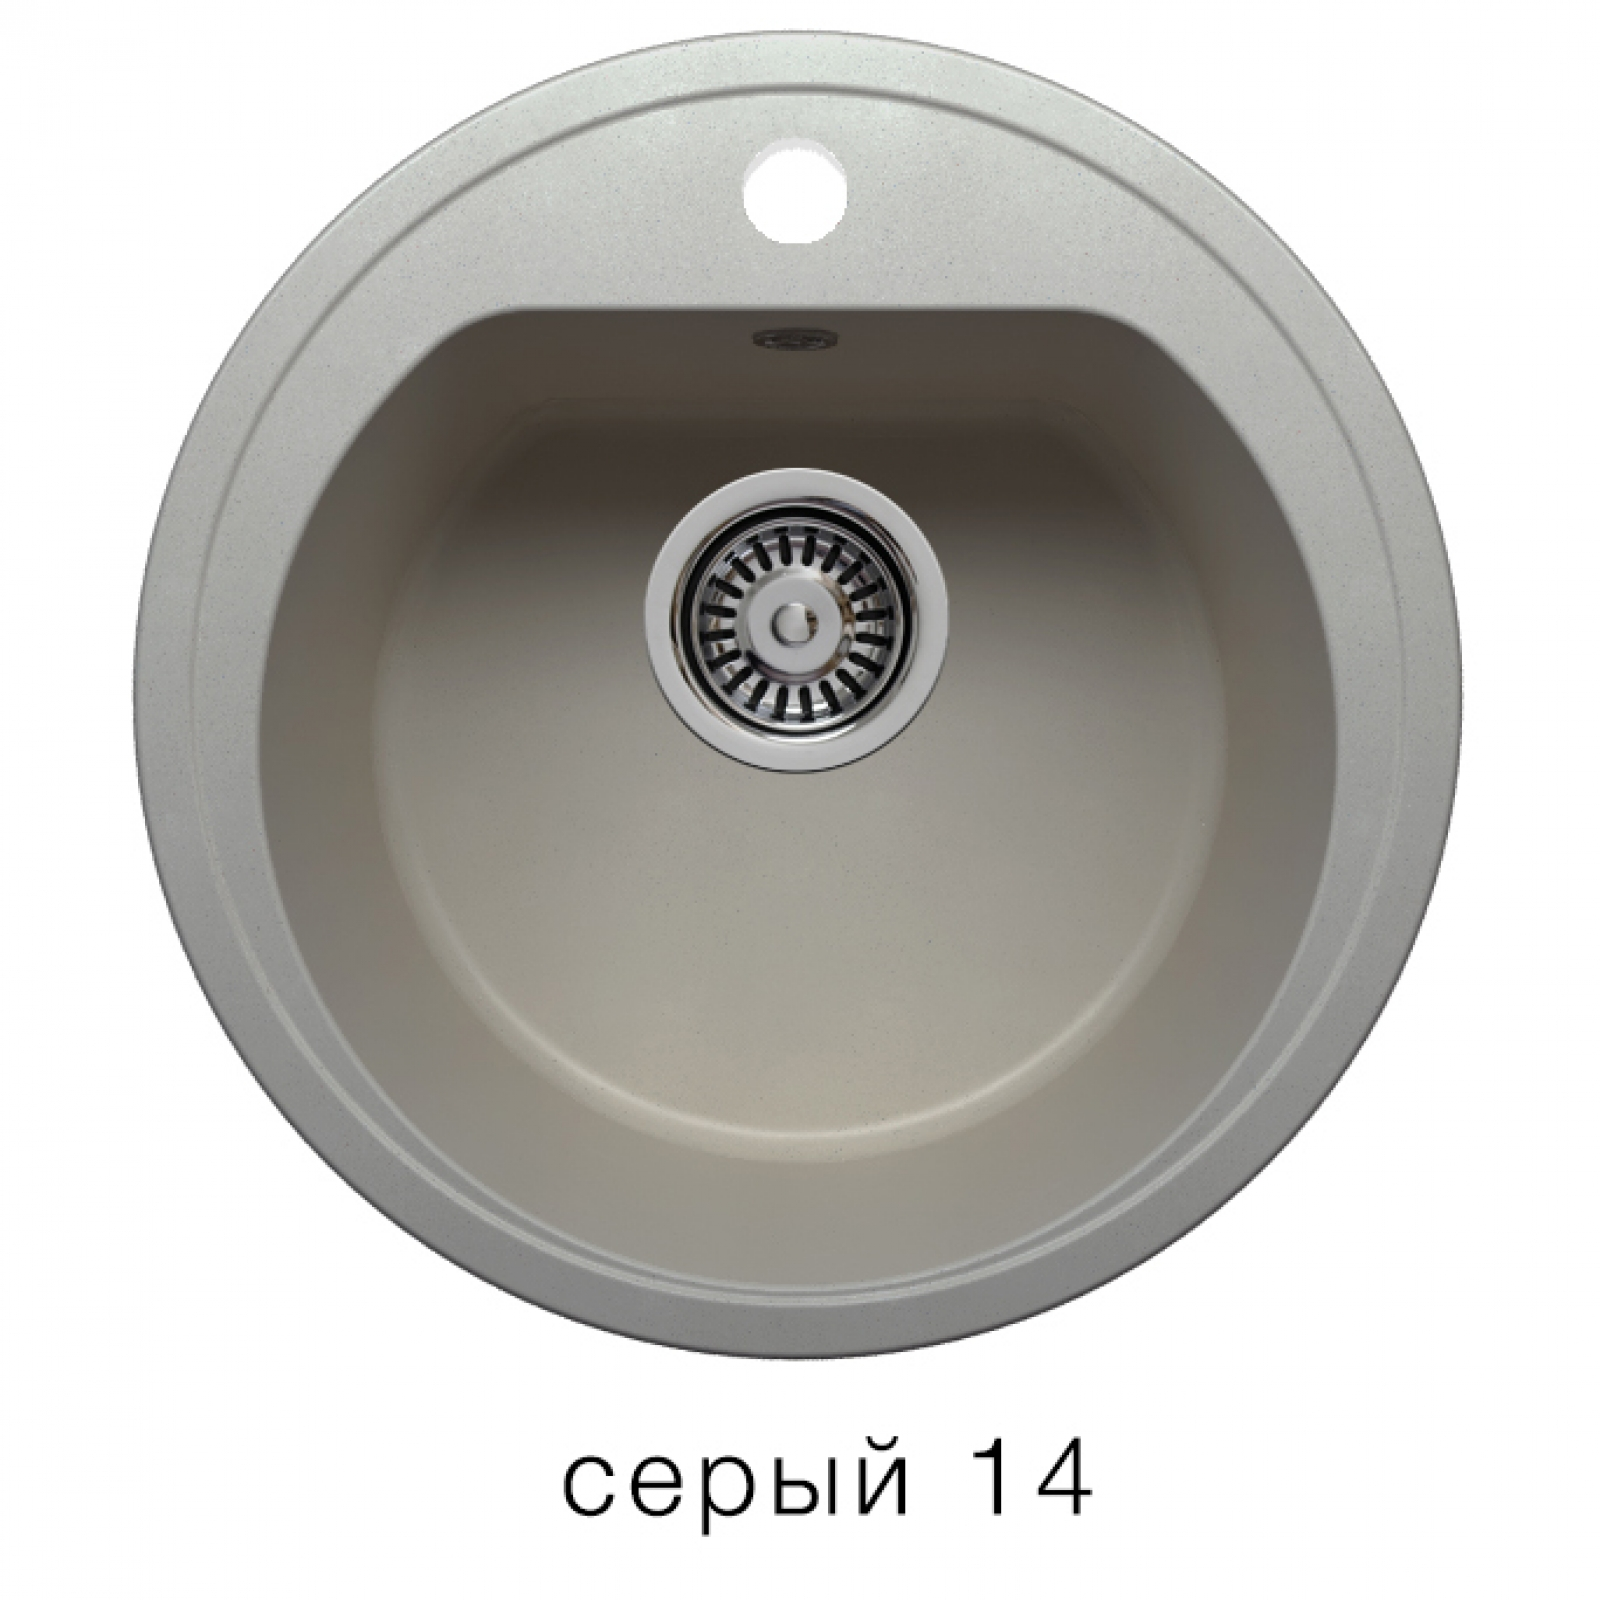 Мойка Polygran-F-05-014, цвет - Серый